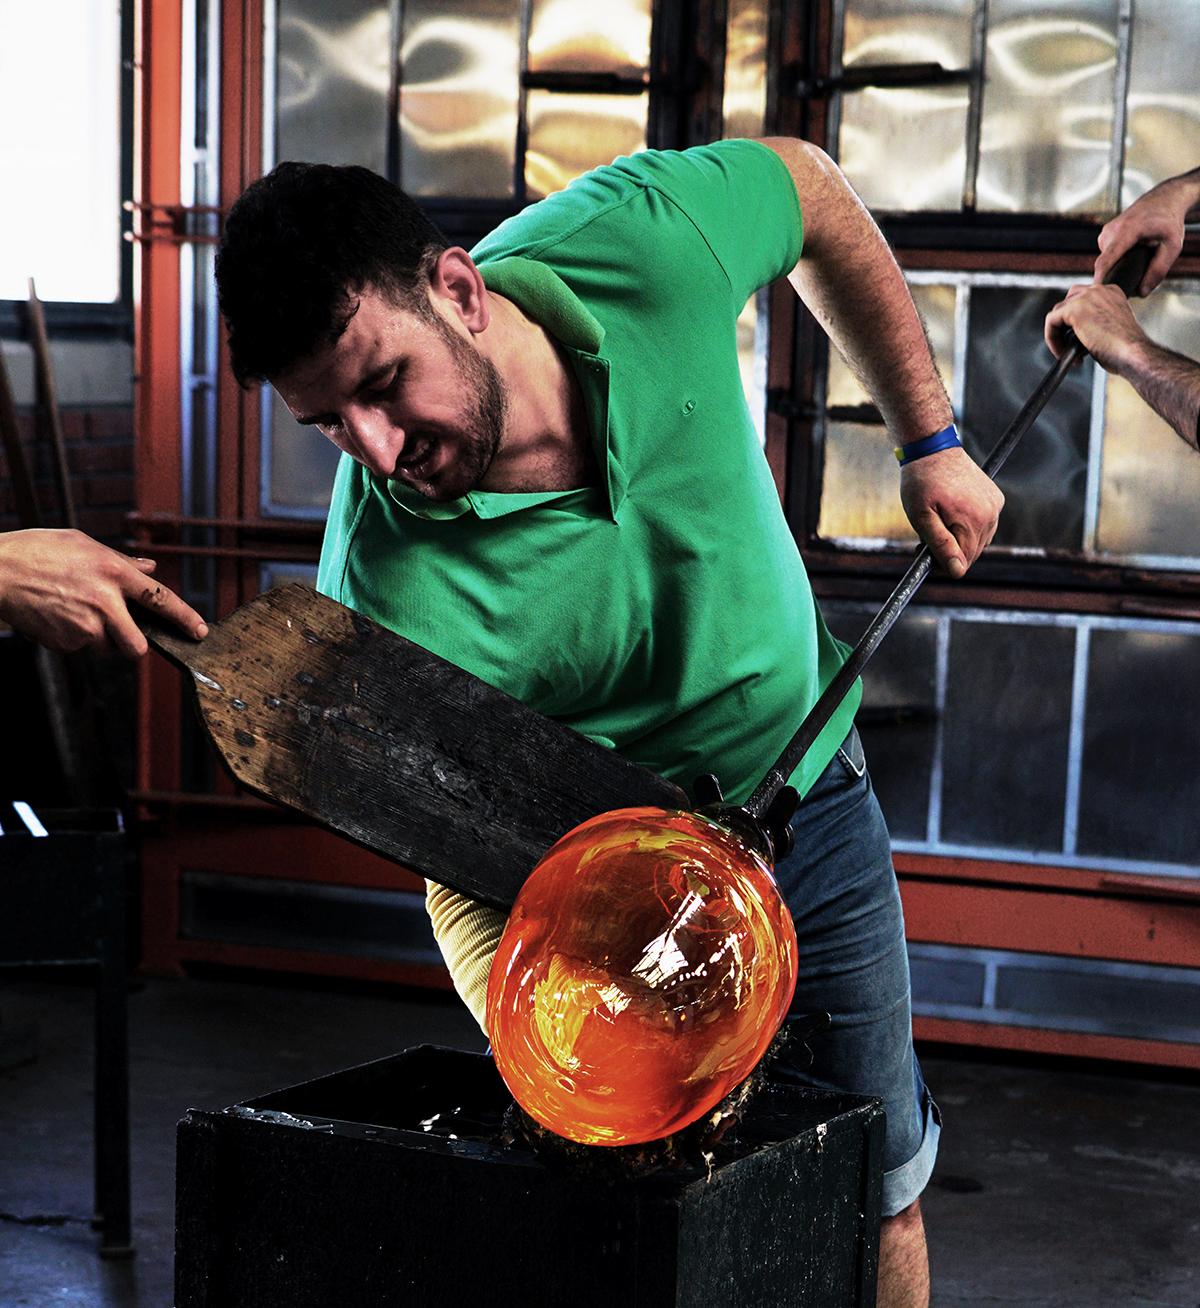 #71 —Beykoz – The Glassblowers' Foundation. This glass artisan Mehmet Kömürcü has 20 years' experience in the job.